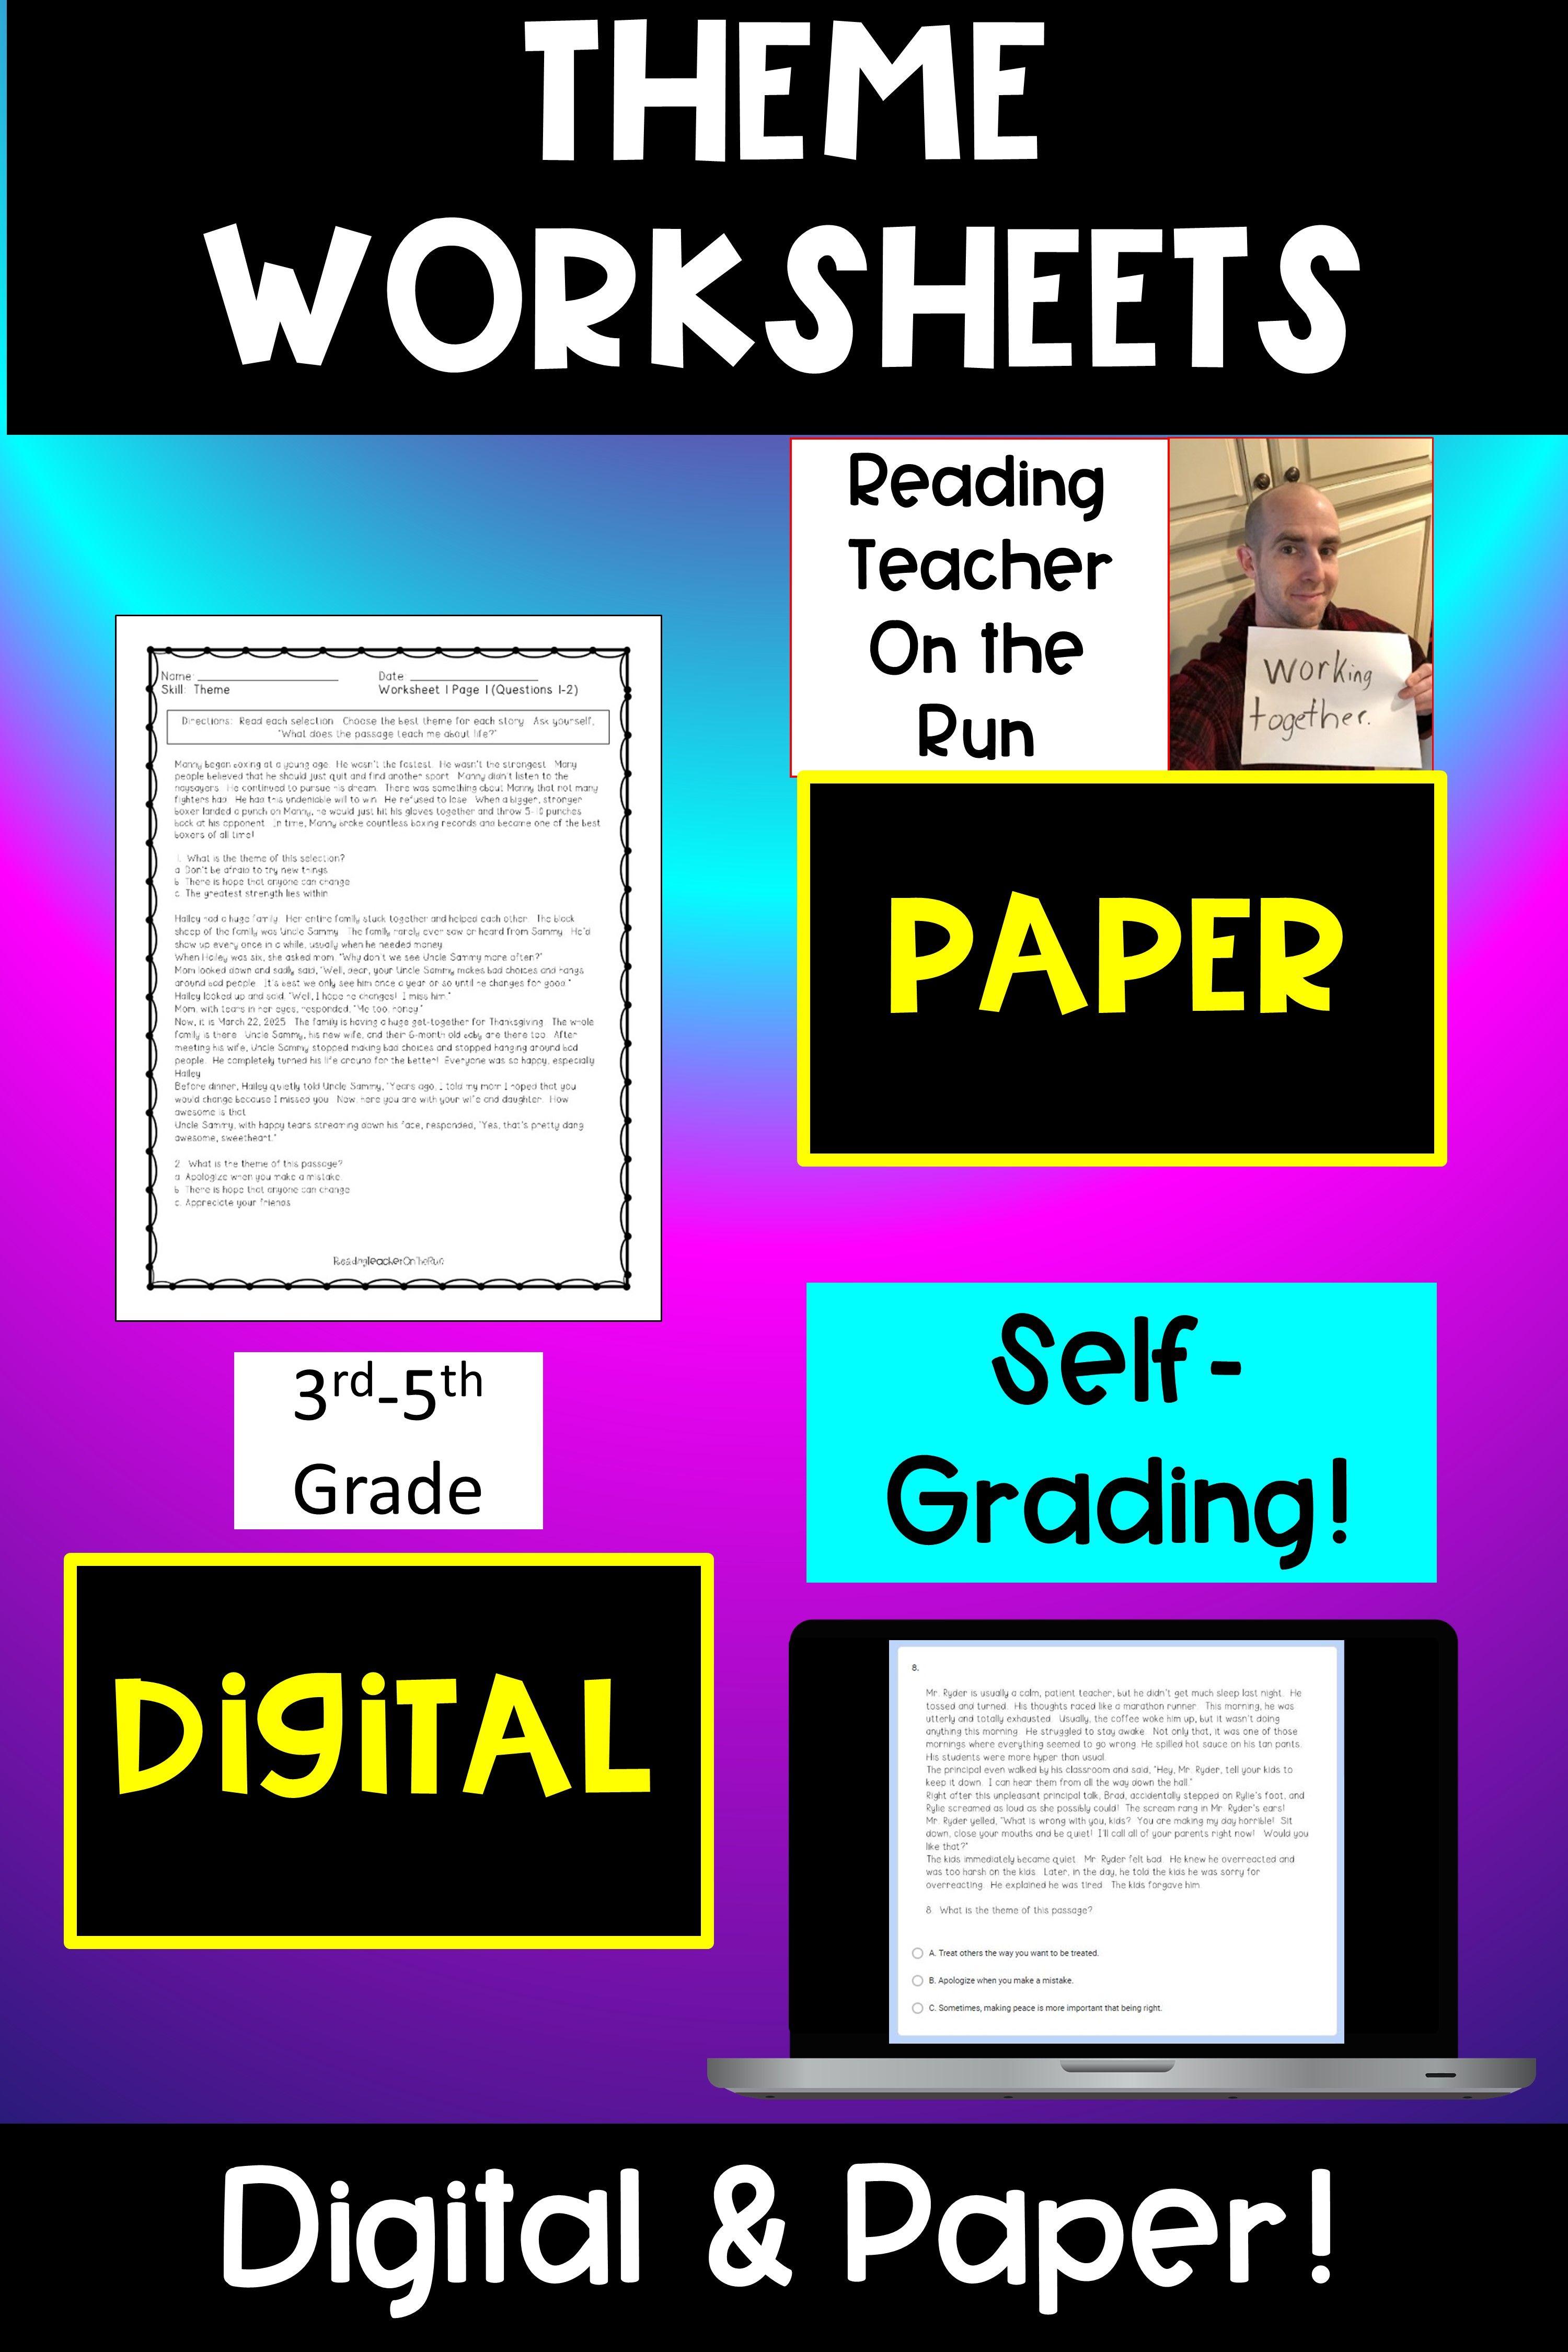 Digital Print Theme Worksheets In 2020 3rd Grade Reading 4th Grade Reading Worksheets